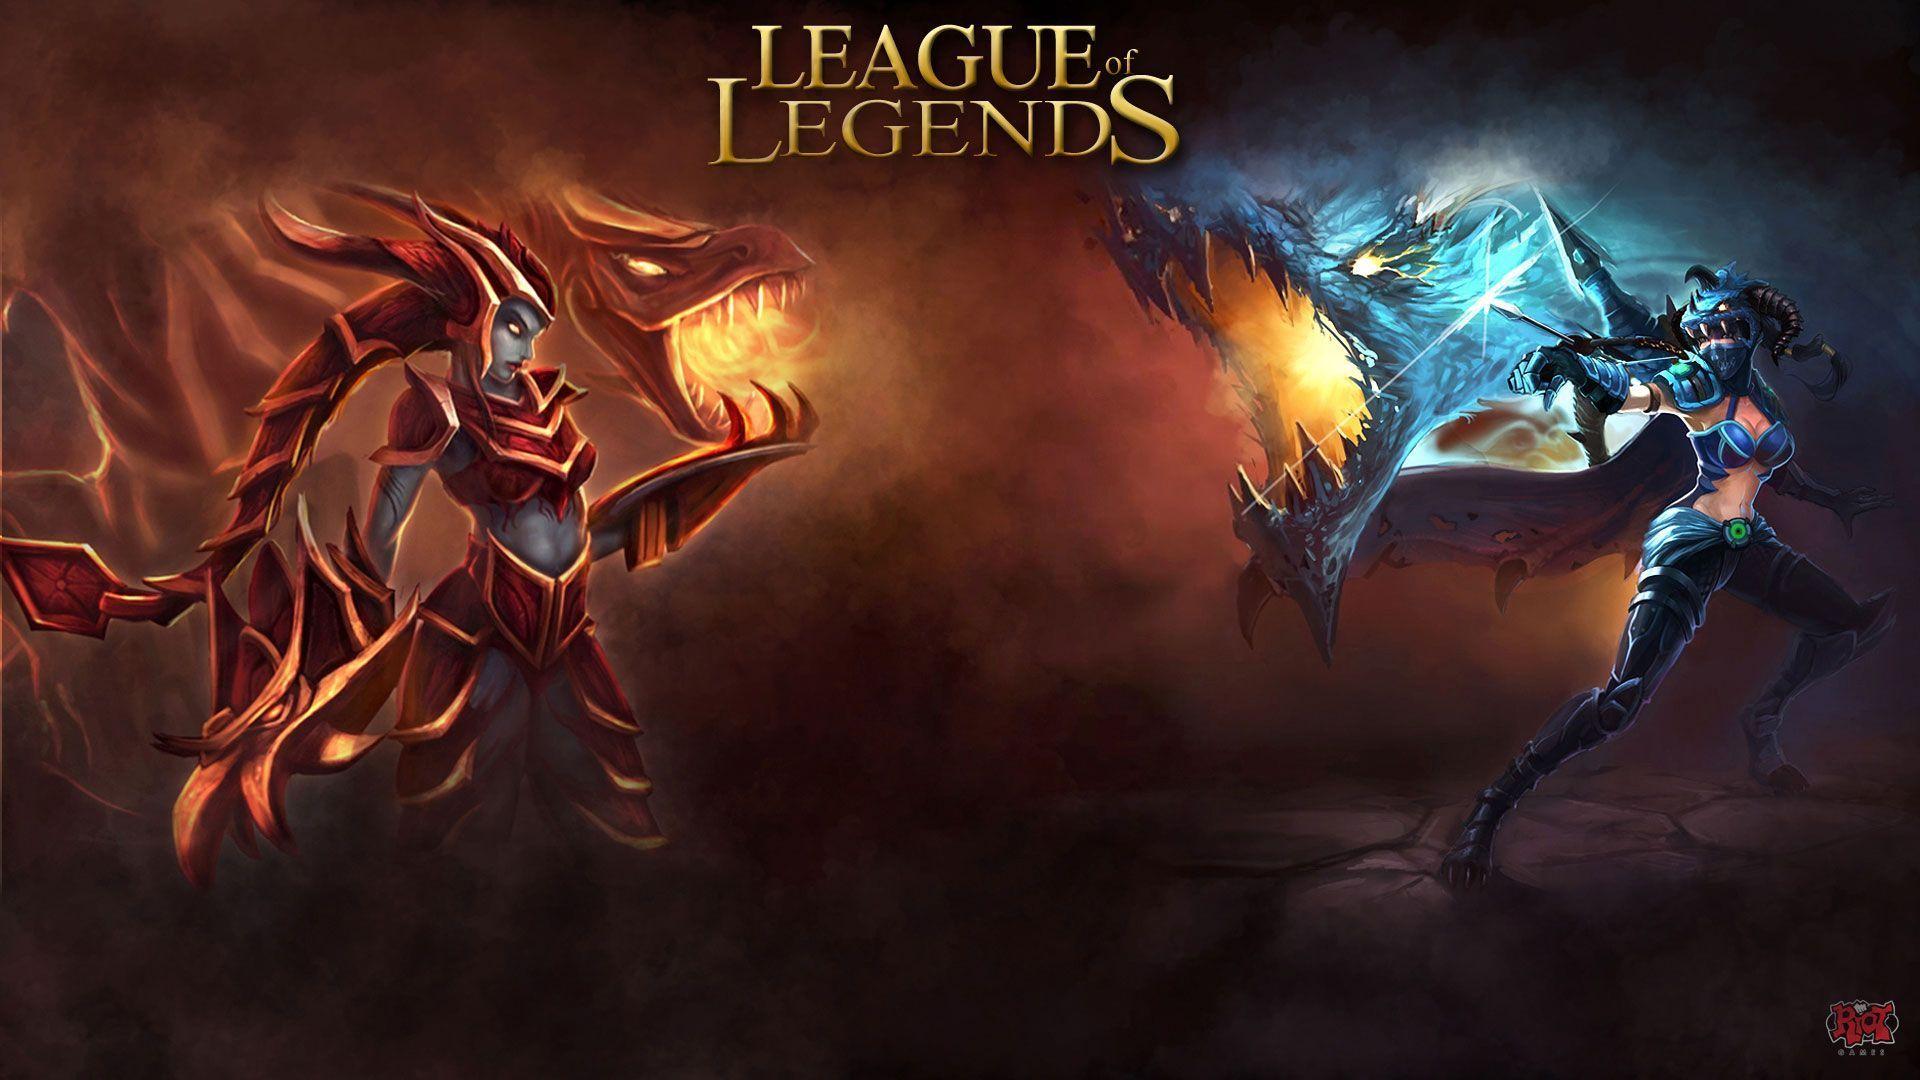 League Of Legends Wallpapers HD Yasuo Vs Riven ArtOf 1920x1080 Lol 37